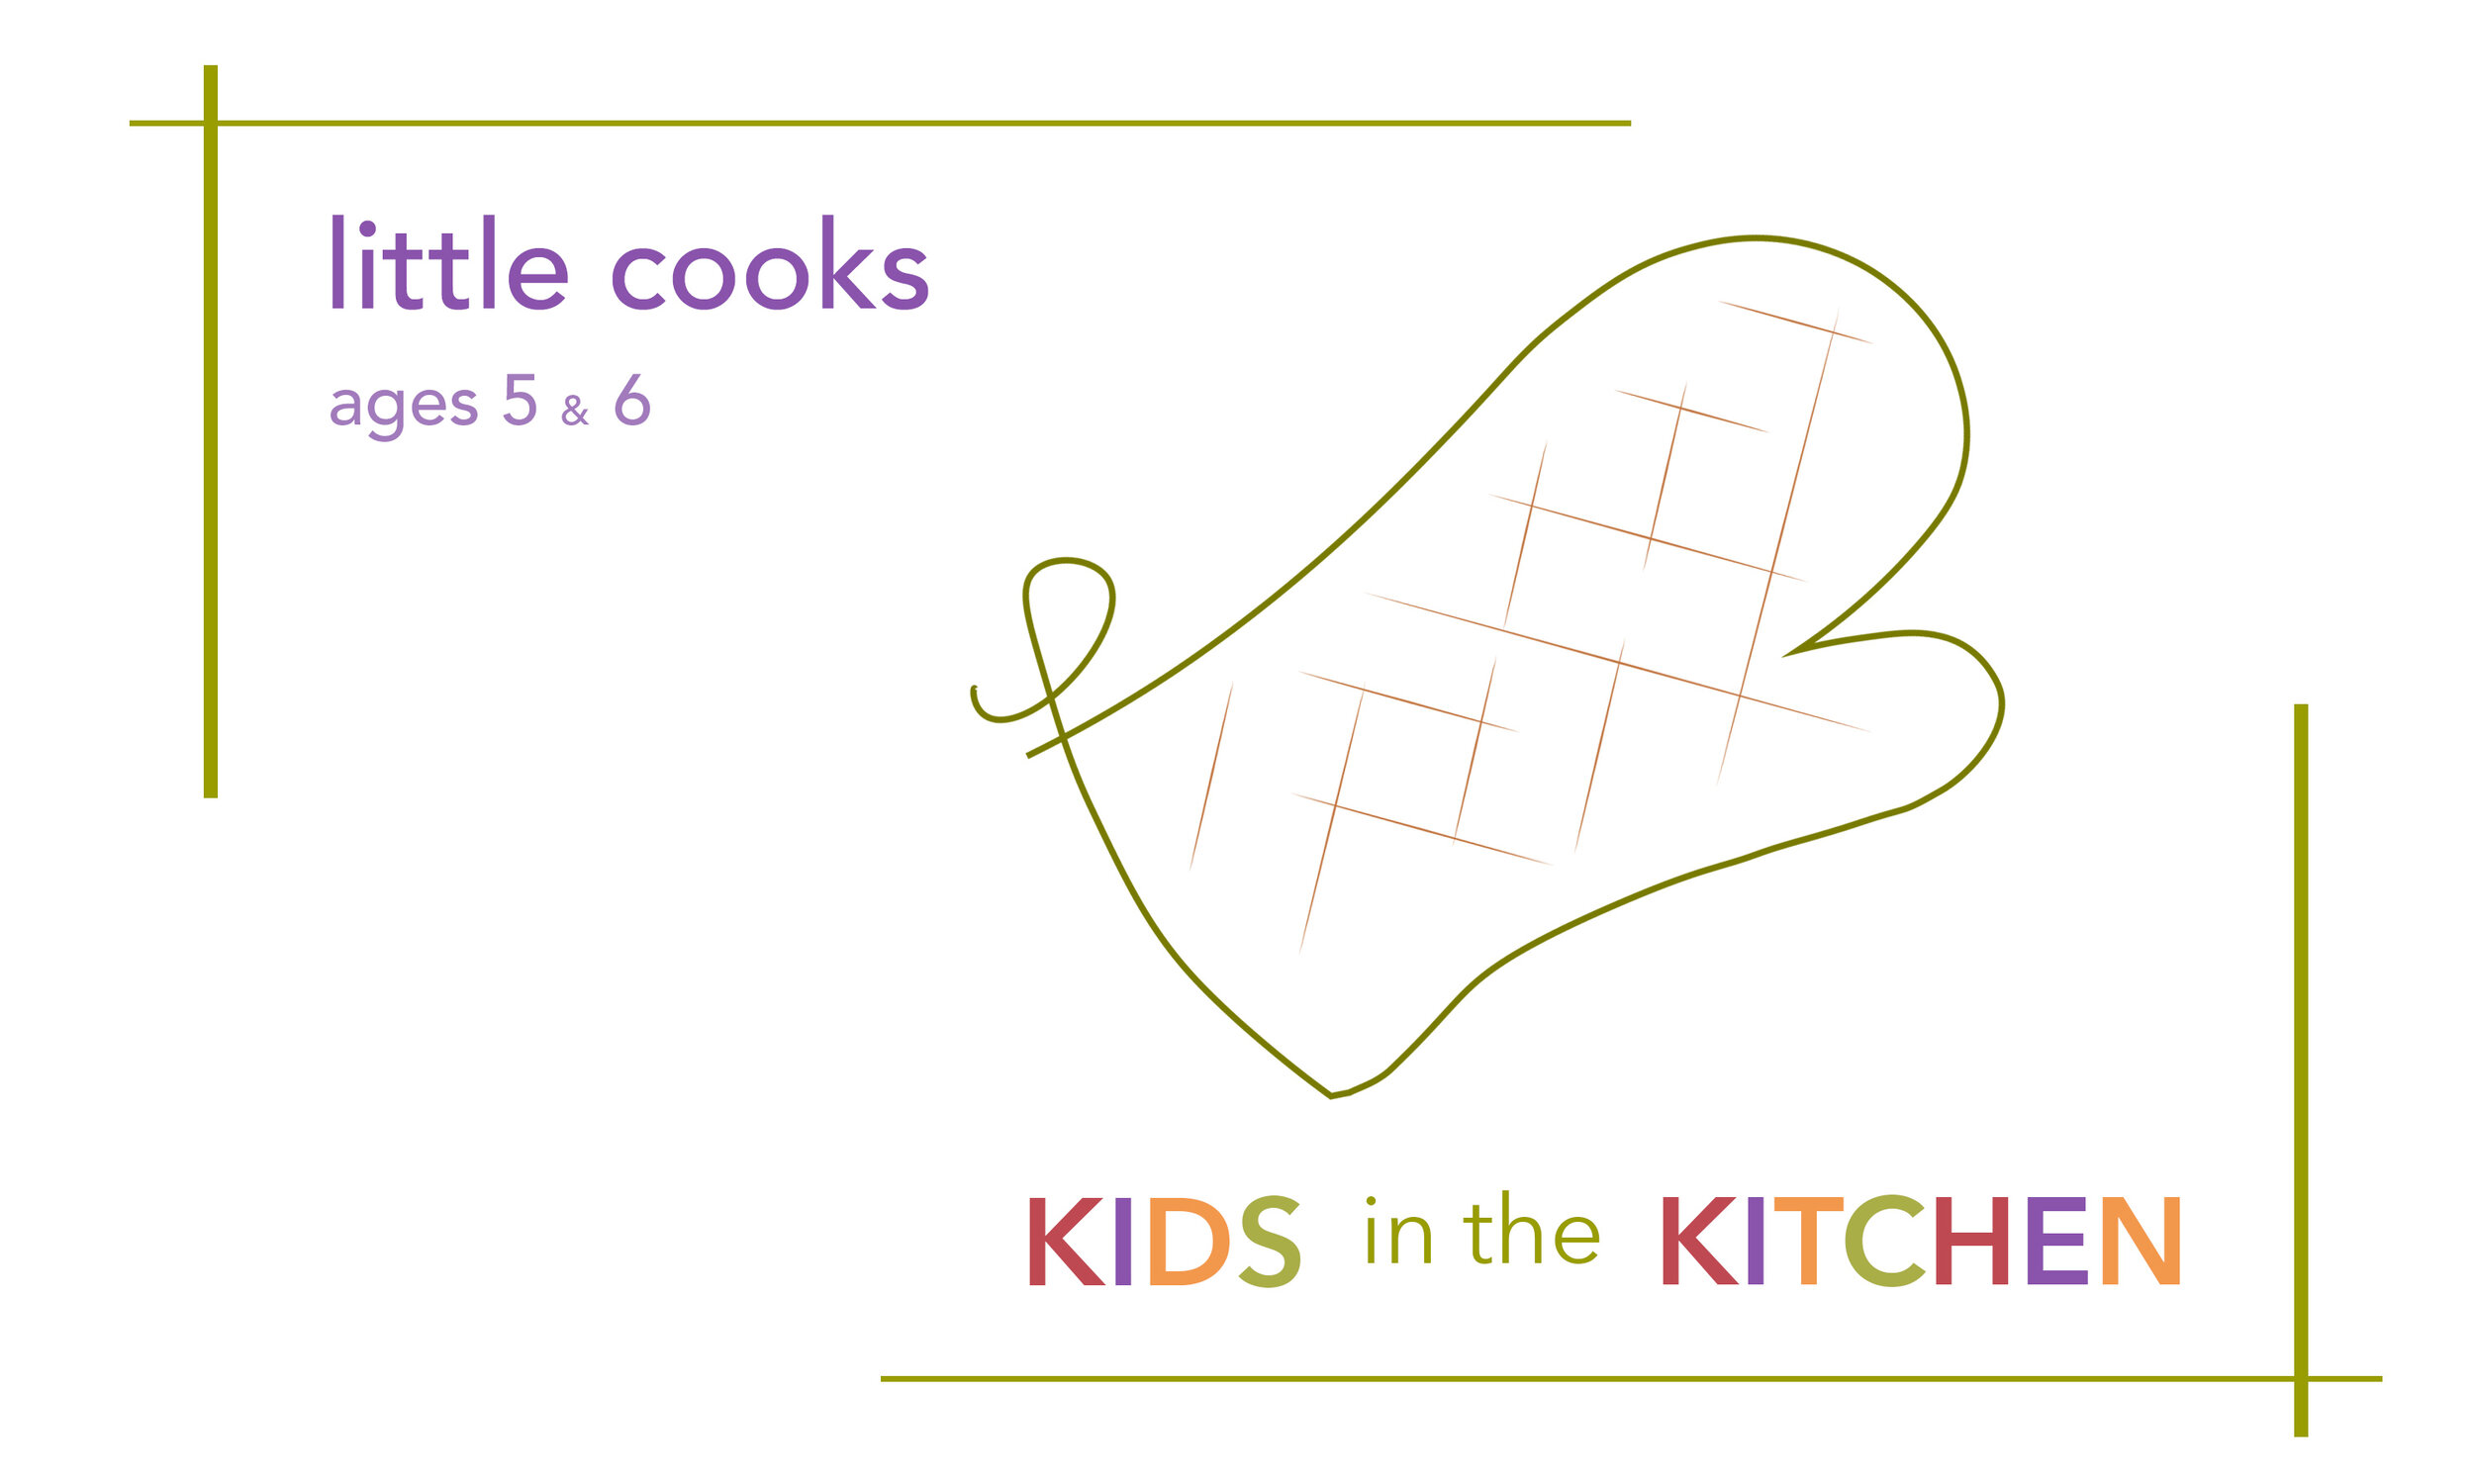 kids in the kitchen (little cooks).jpg